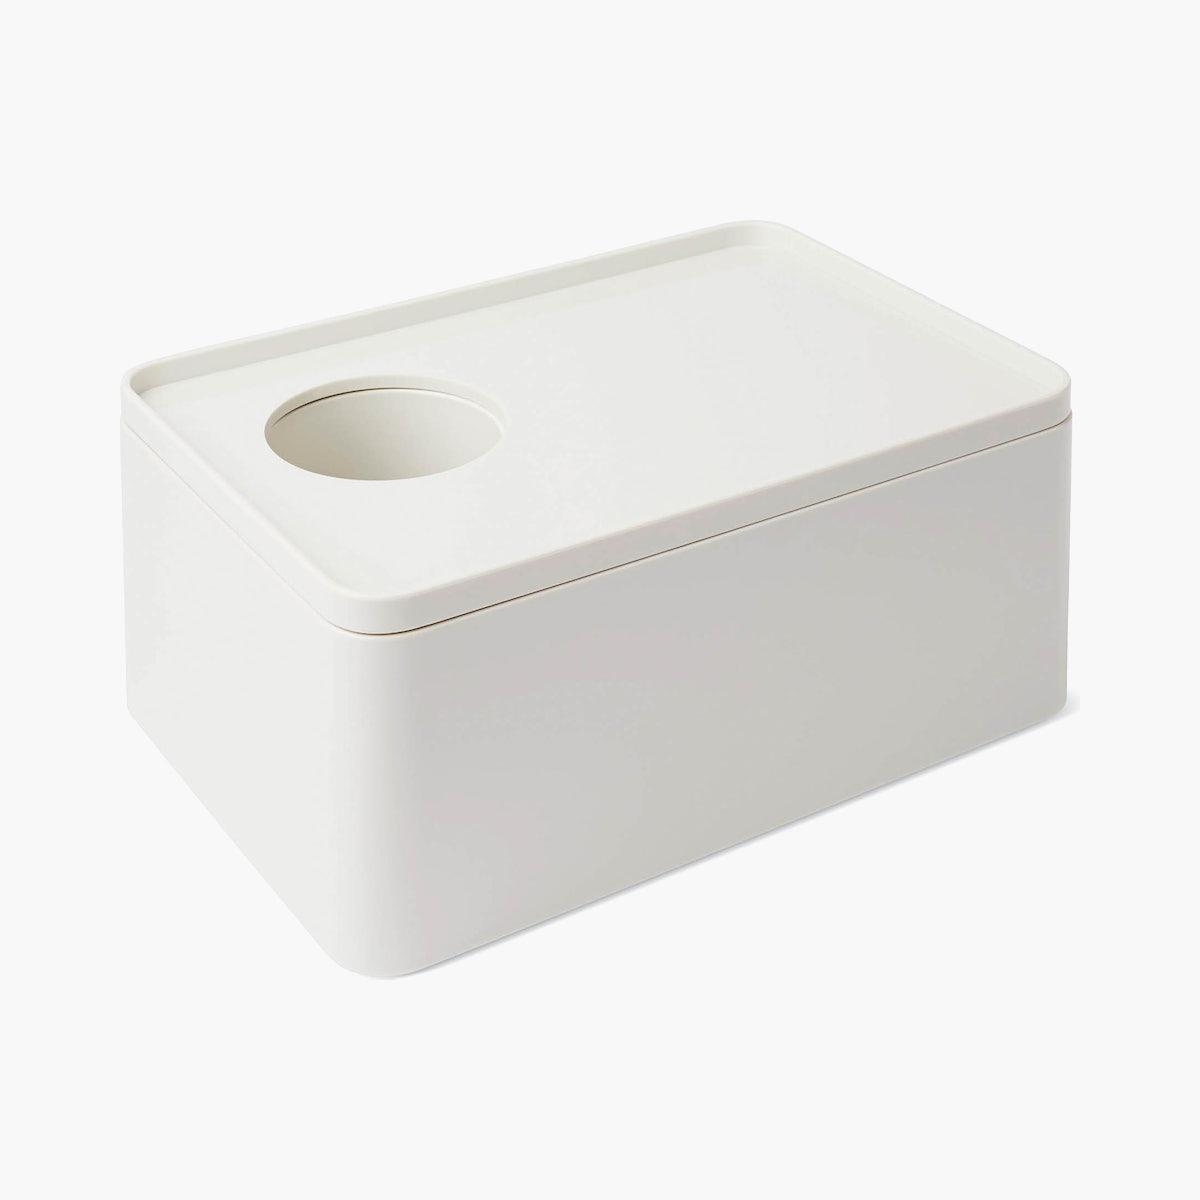 Formwork Box